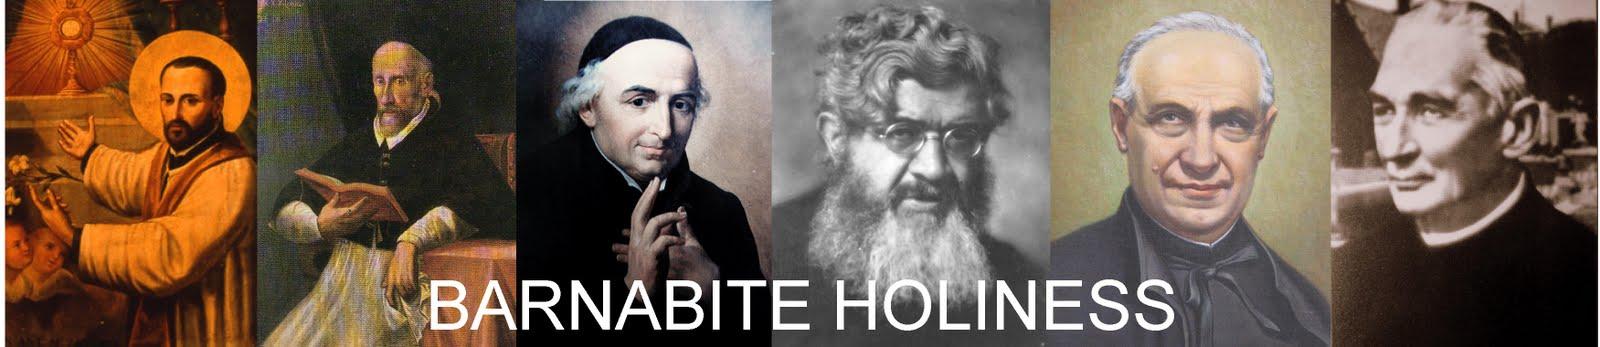 BARNABITE HOLINESS